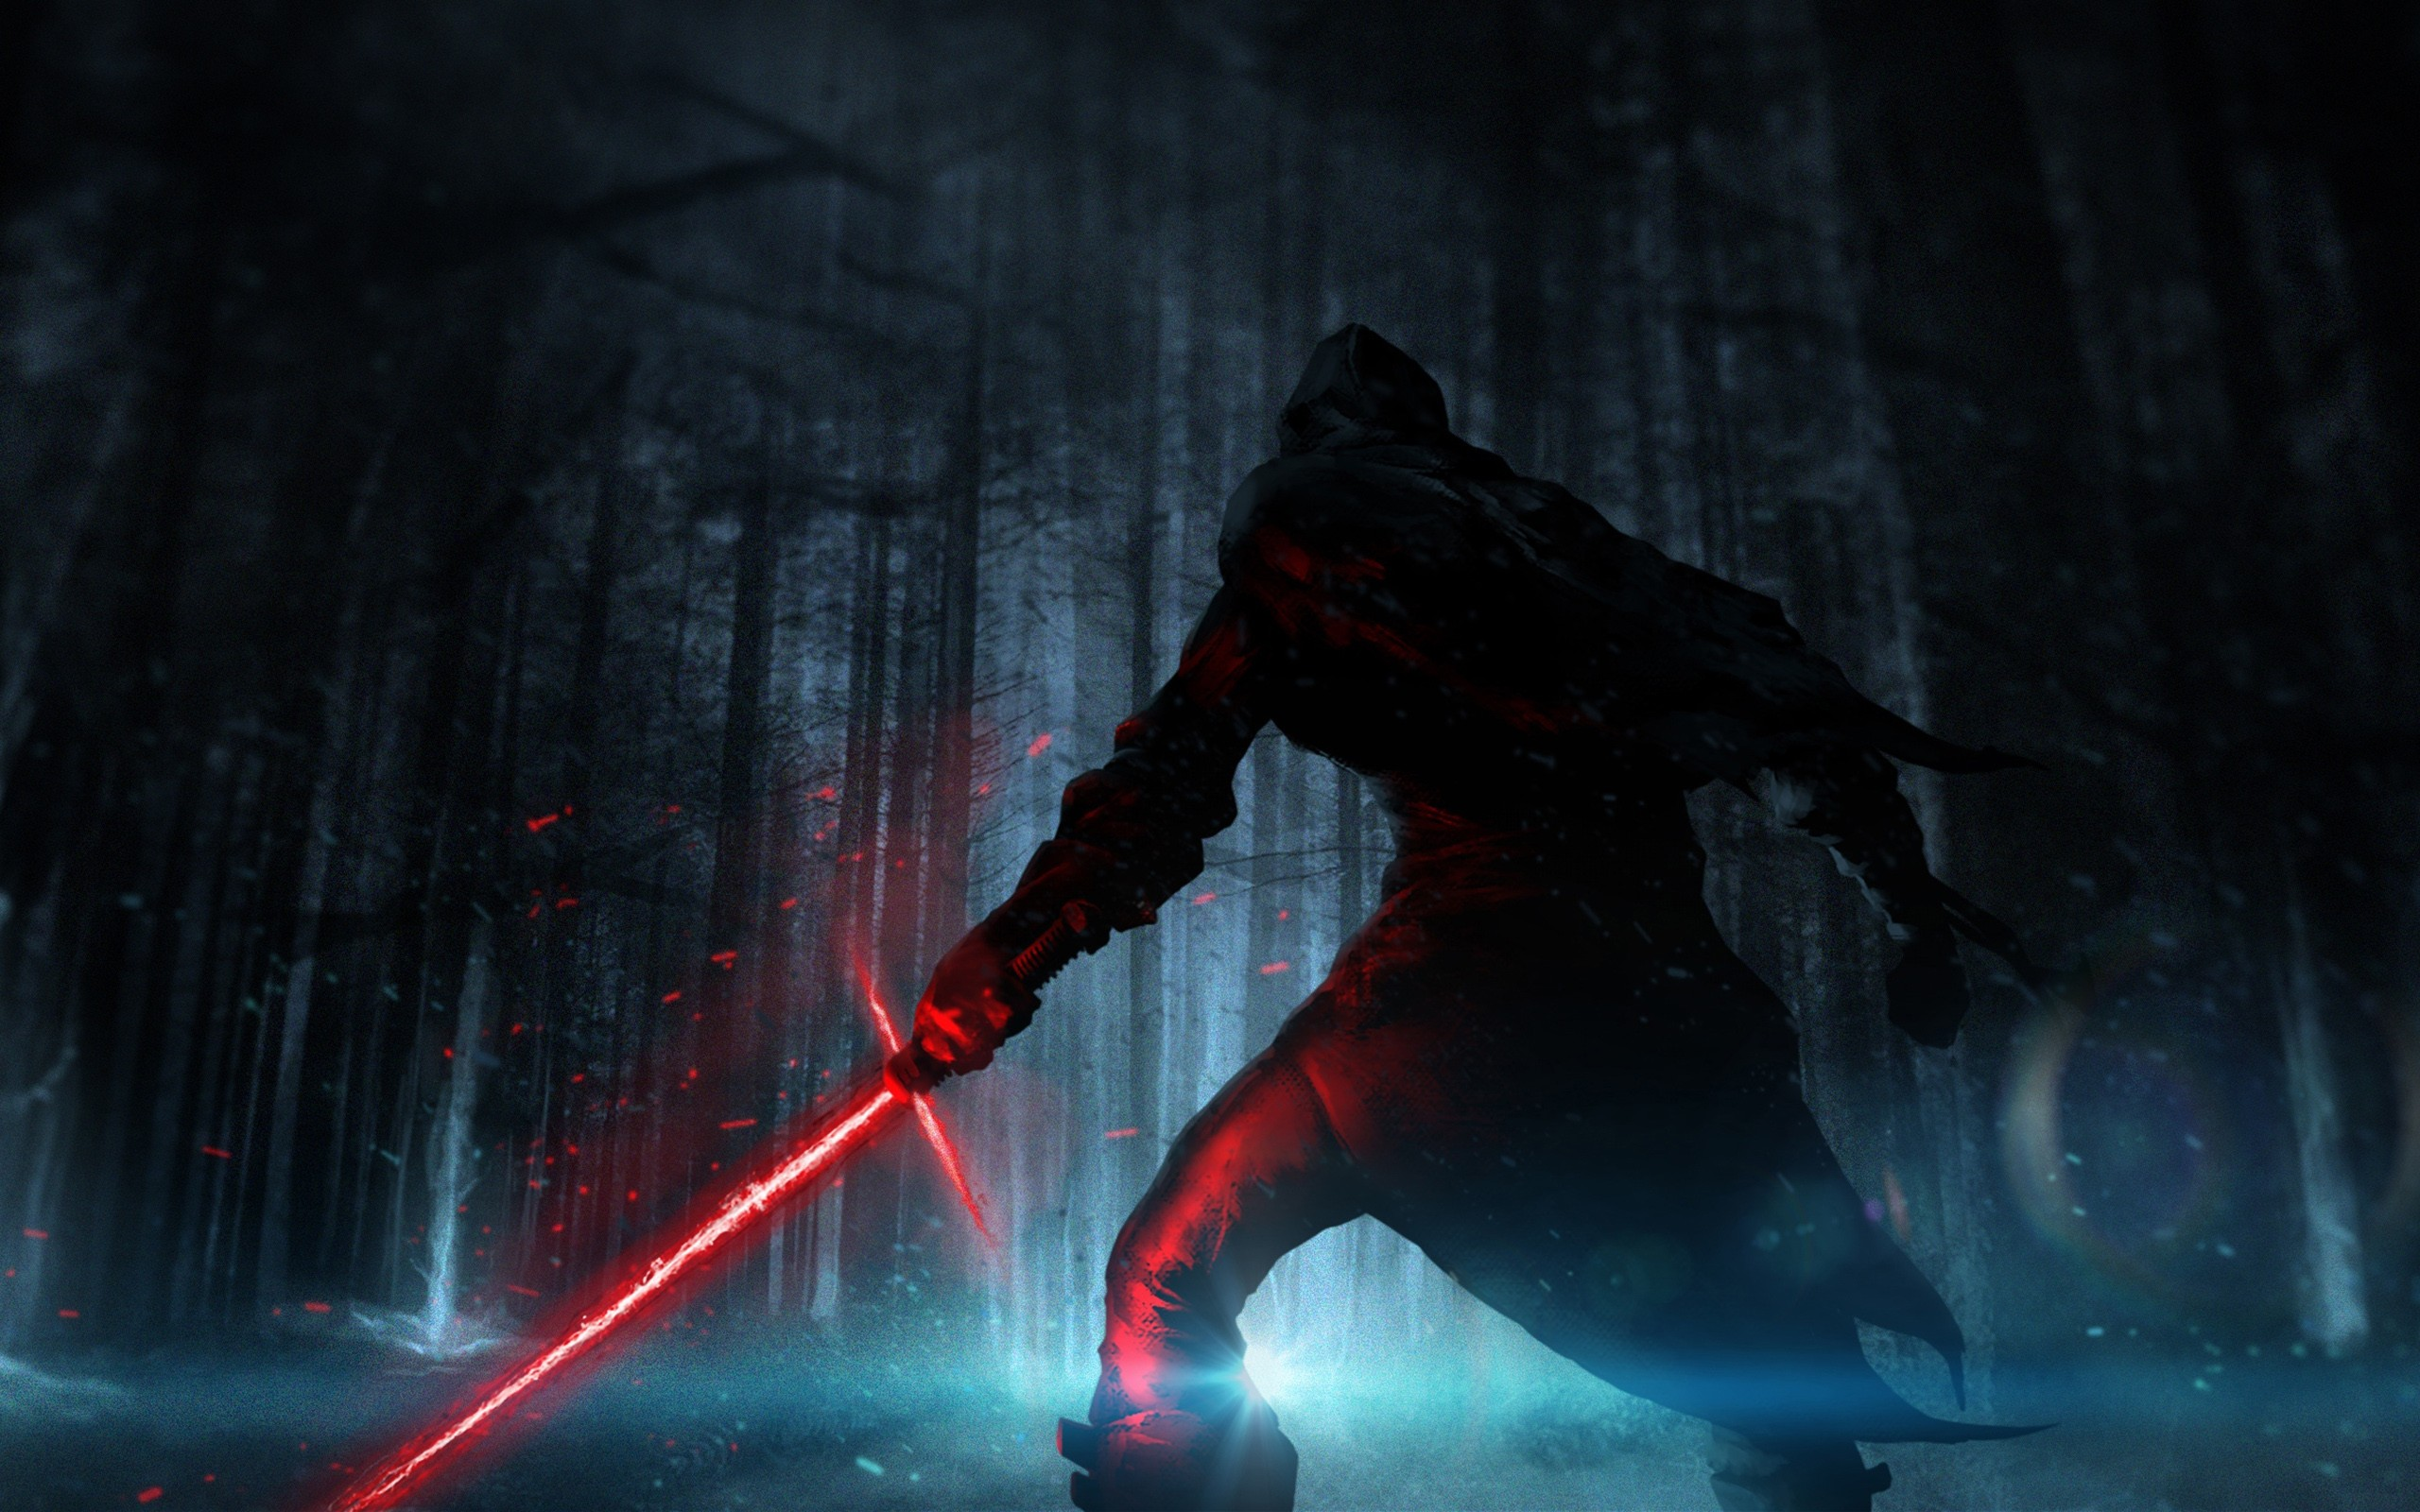 Star wars ep7 the force awakens 2 hd hd movies 4k - Star wars the force awakens desktop wallpaper ...